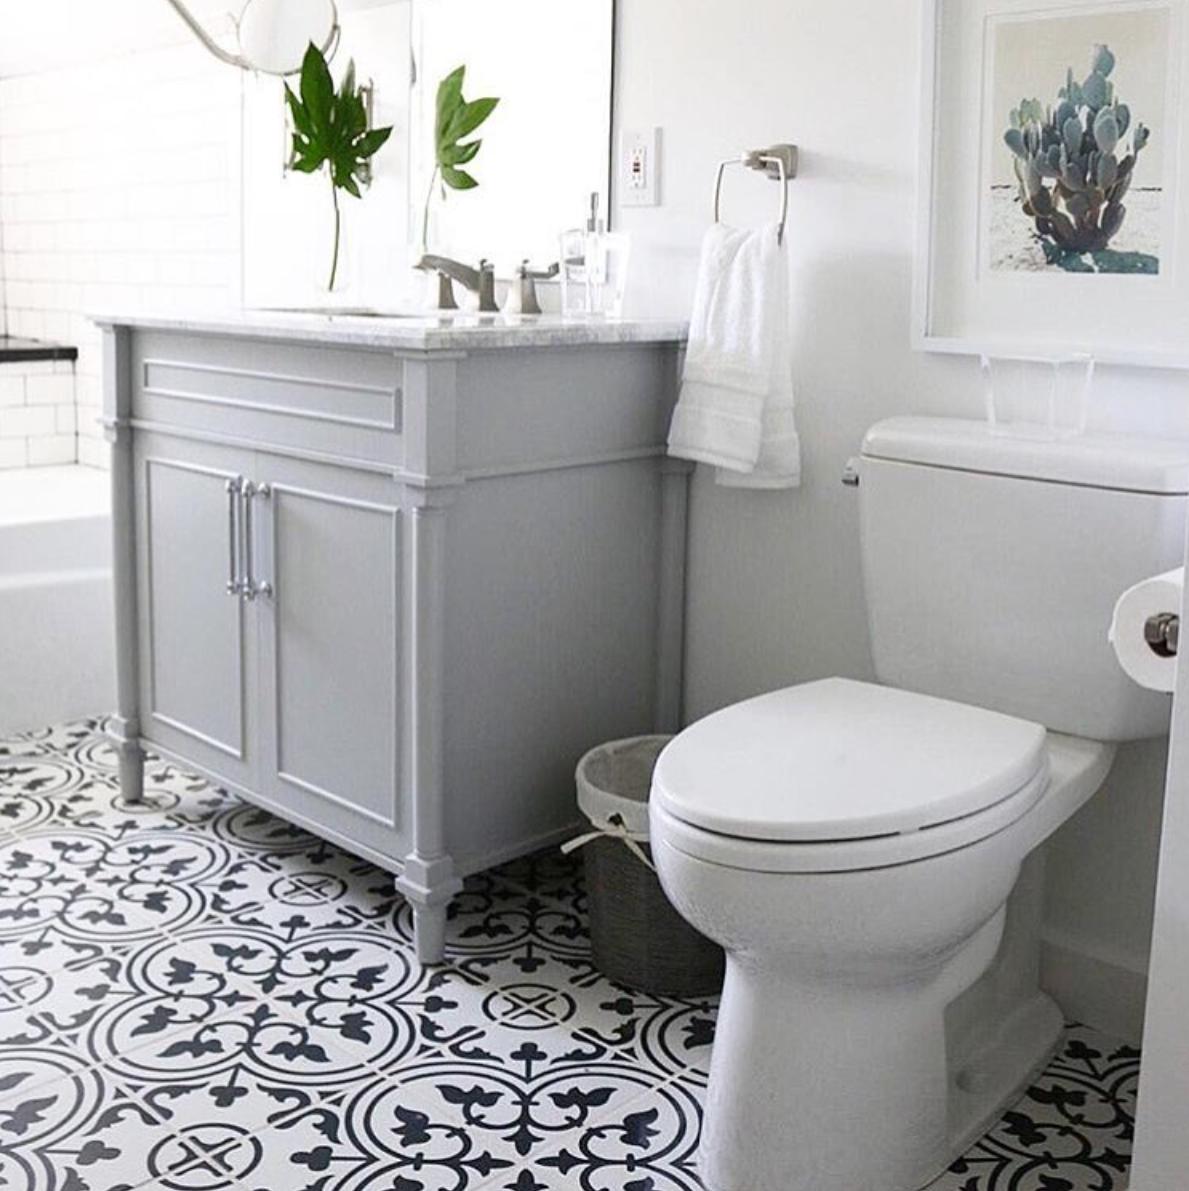 Arch lifestyle bathroom styles 2017 for Bathroom styles 2017